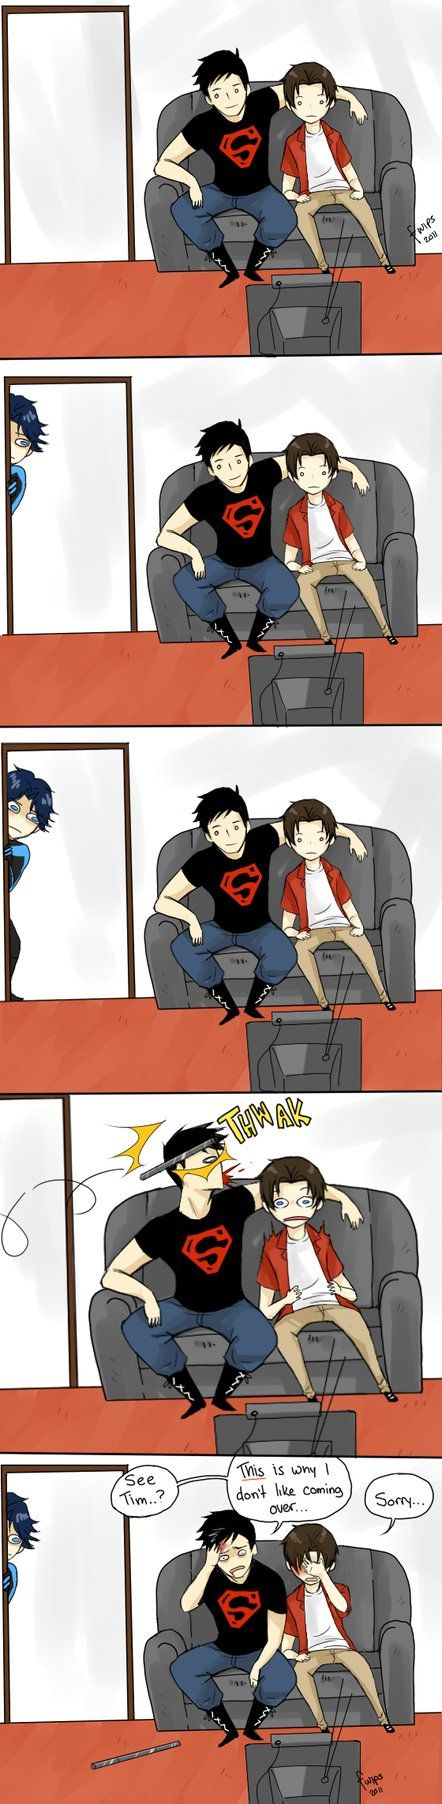 cockblock Nightwing by Axis33 on DeviantArt  <-- bahahahahahahahahahaha, this is glorious